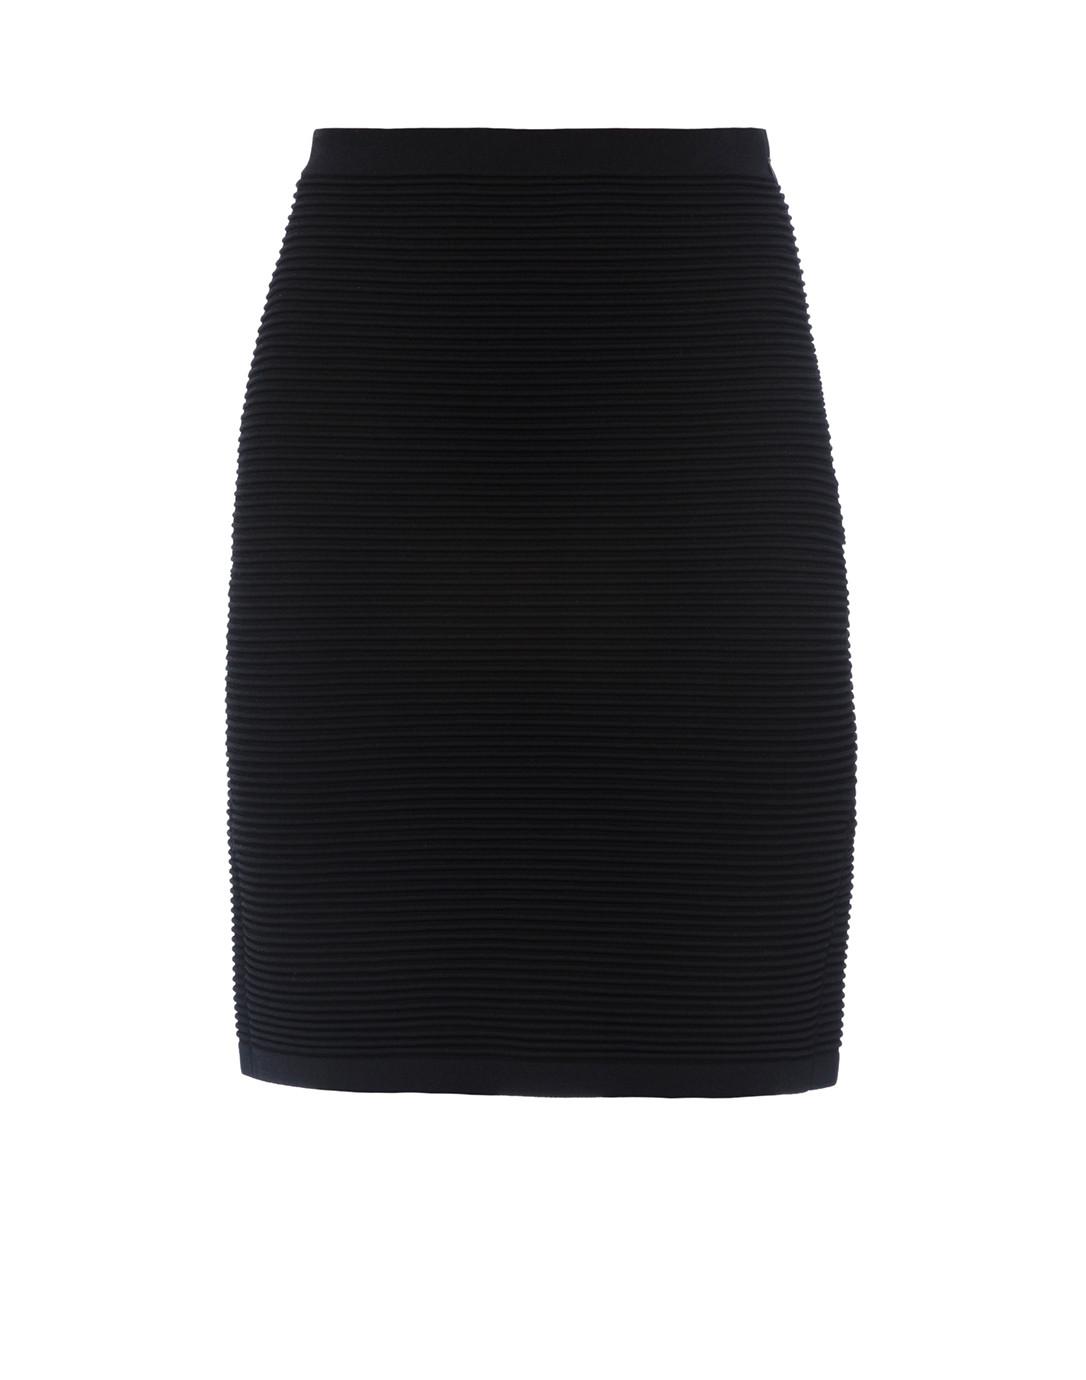 2485c316e0 Black Ottoman Stitch Stretch Pencil Skirt | Emporio Armani | Halsbrook